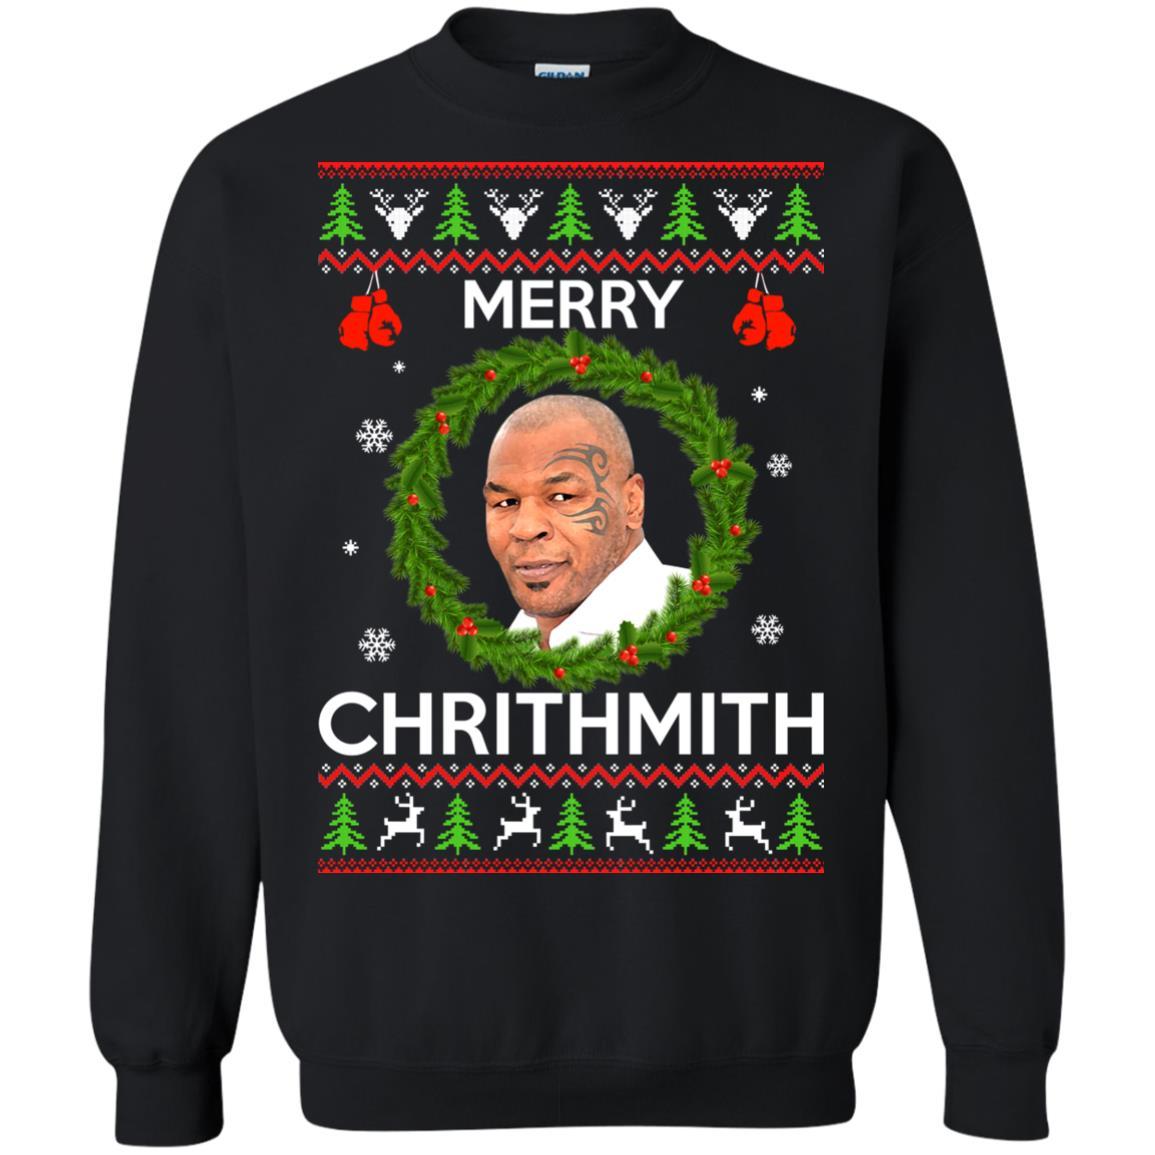 image 841px Mike Tyson Christmas Sweater Merry Chrithmith Sweatshirt